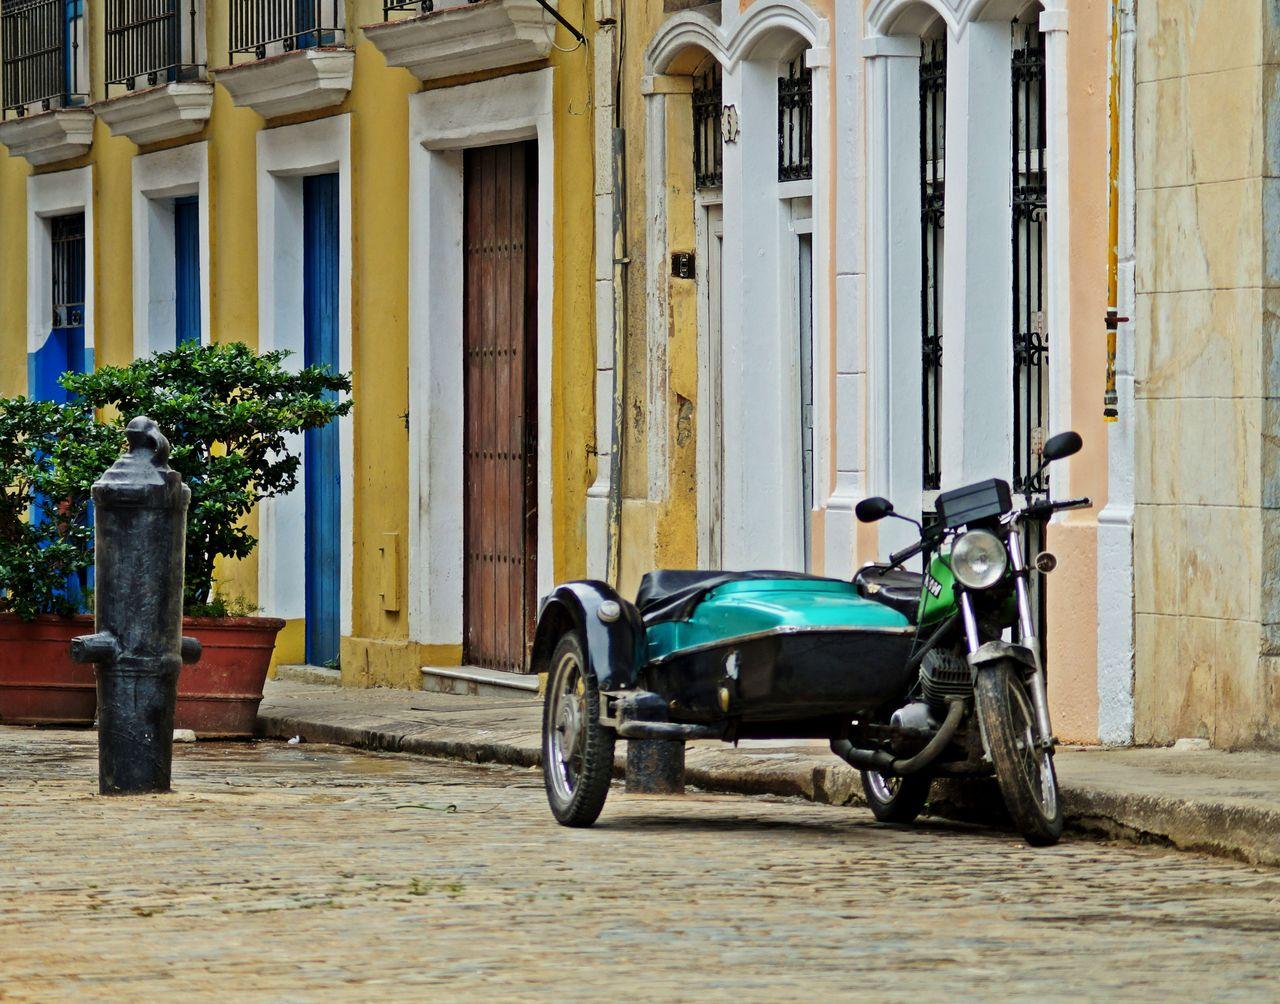 Beautiful stock photos of motorcycle, Architecture, Bollard, Building, Building Exterior